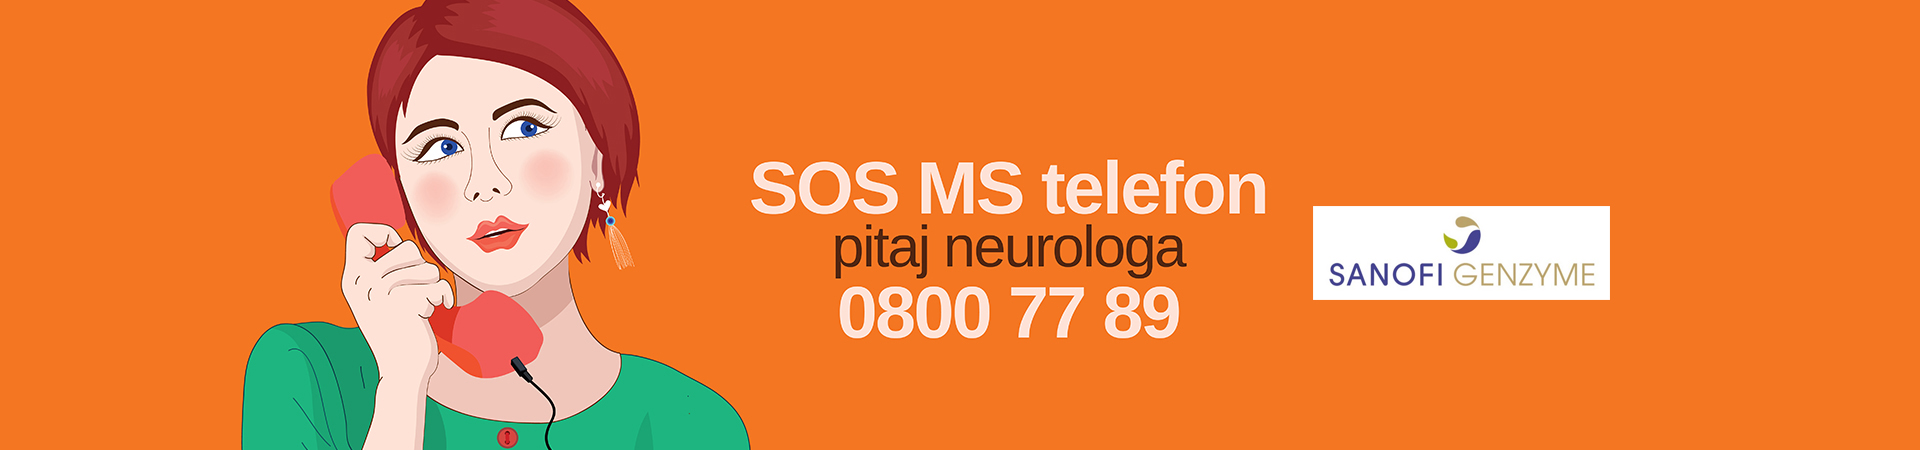 SOS MS telefon – pitaj neurologa